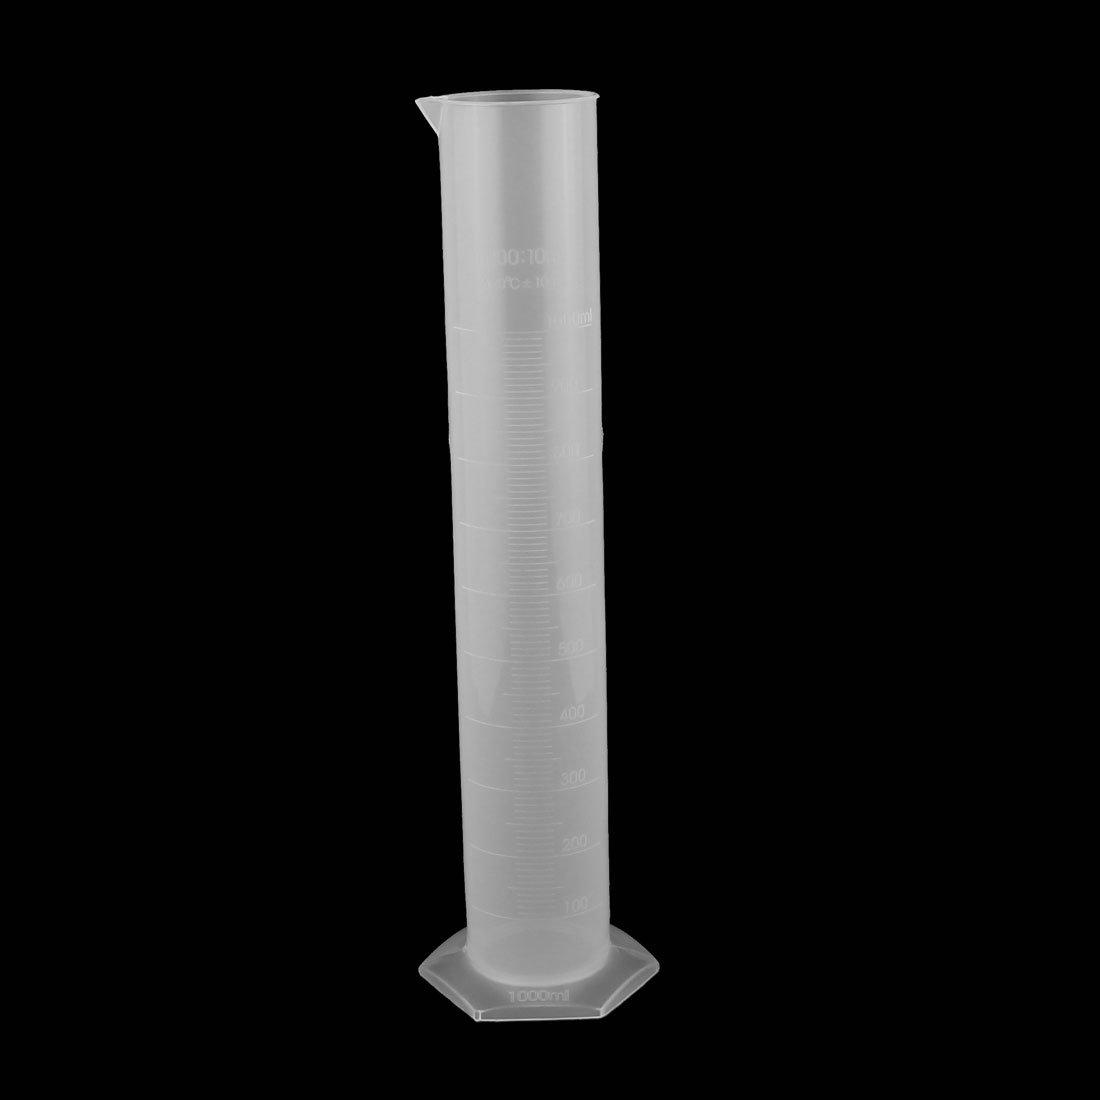 sourcingmap/® 1000mL Labor Sechskant Basis Fl/üssigkeit Messung Kunststoff Messzylinder DE de